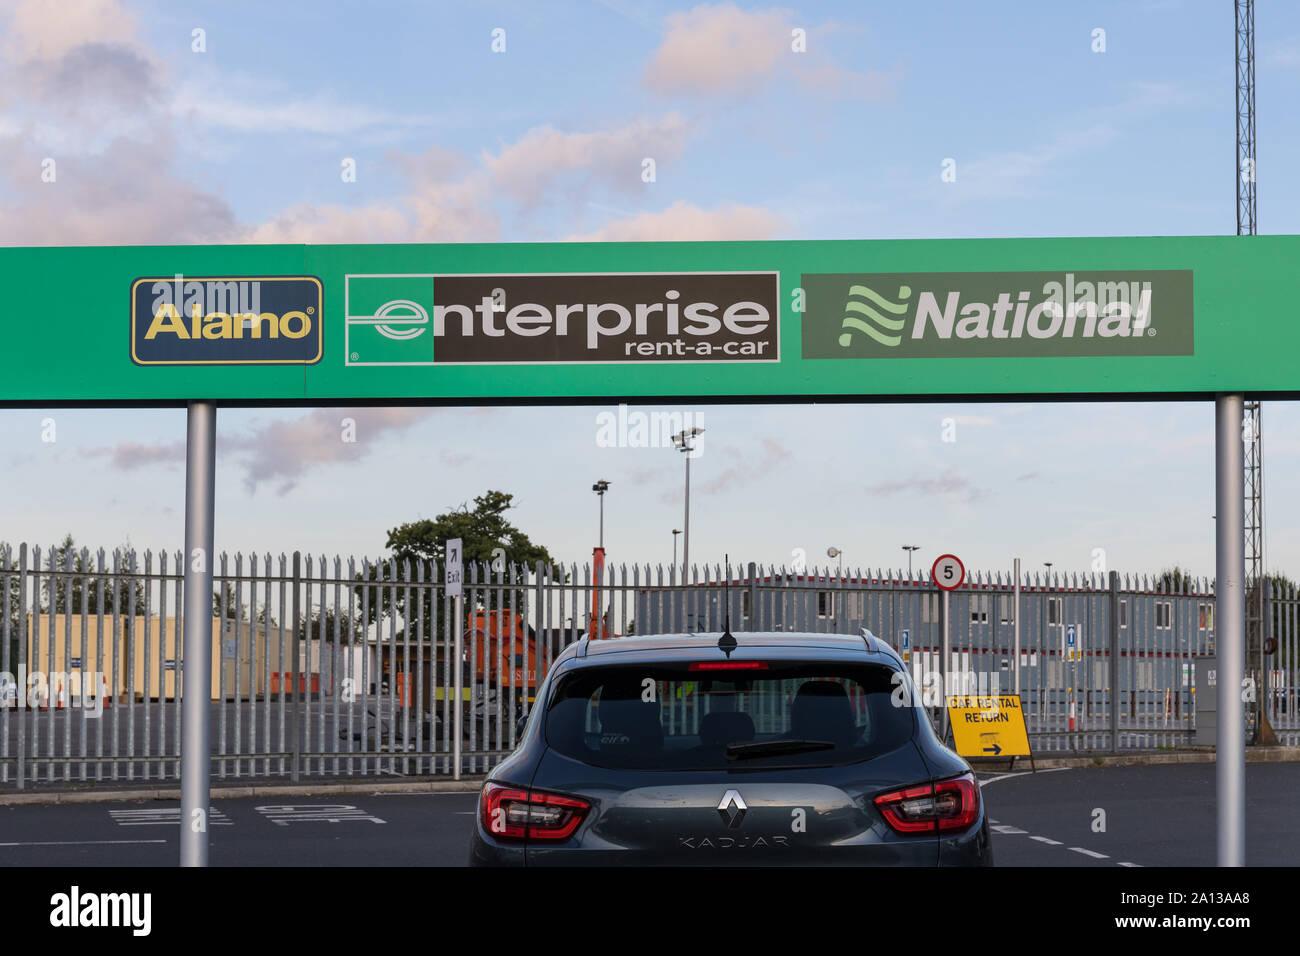 Alamo, Enterprise and National signs at a car rental depot - Manchester Airport Car Rental Village, UK Stock Photo